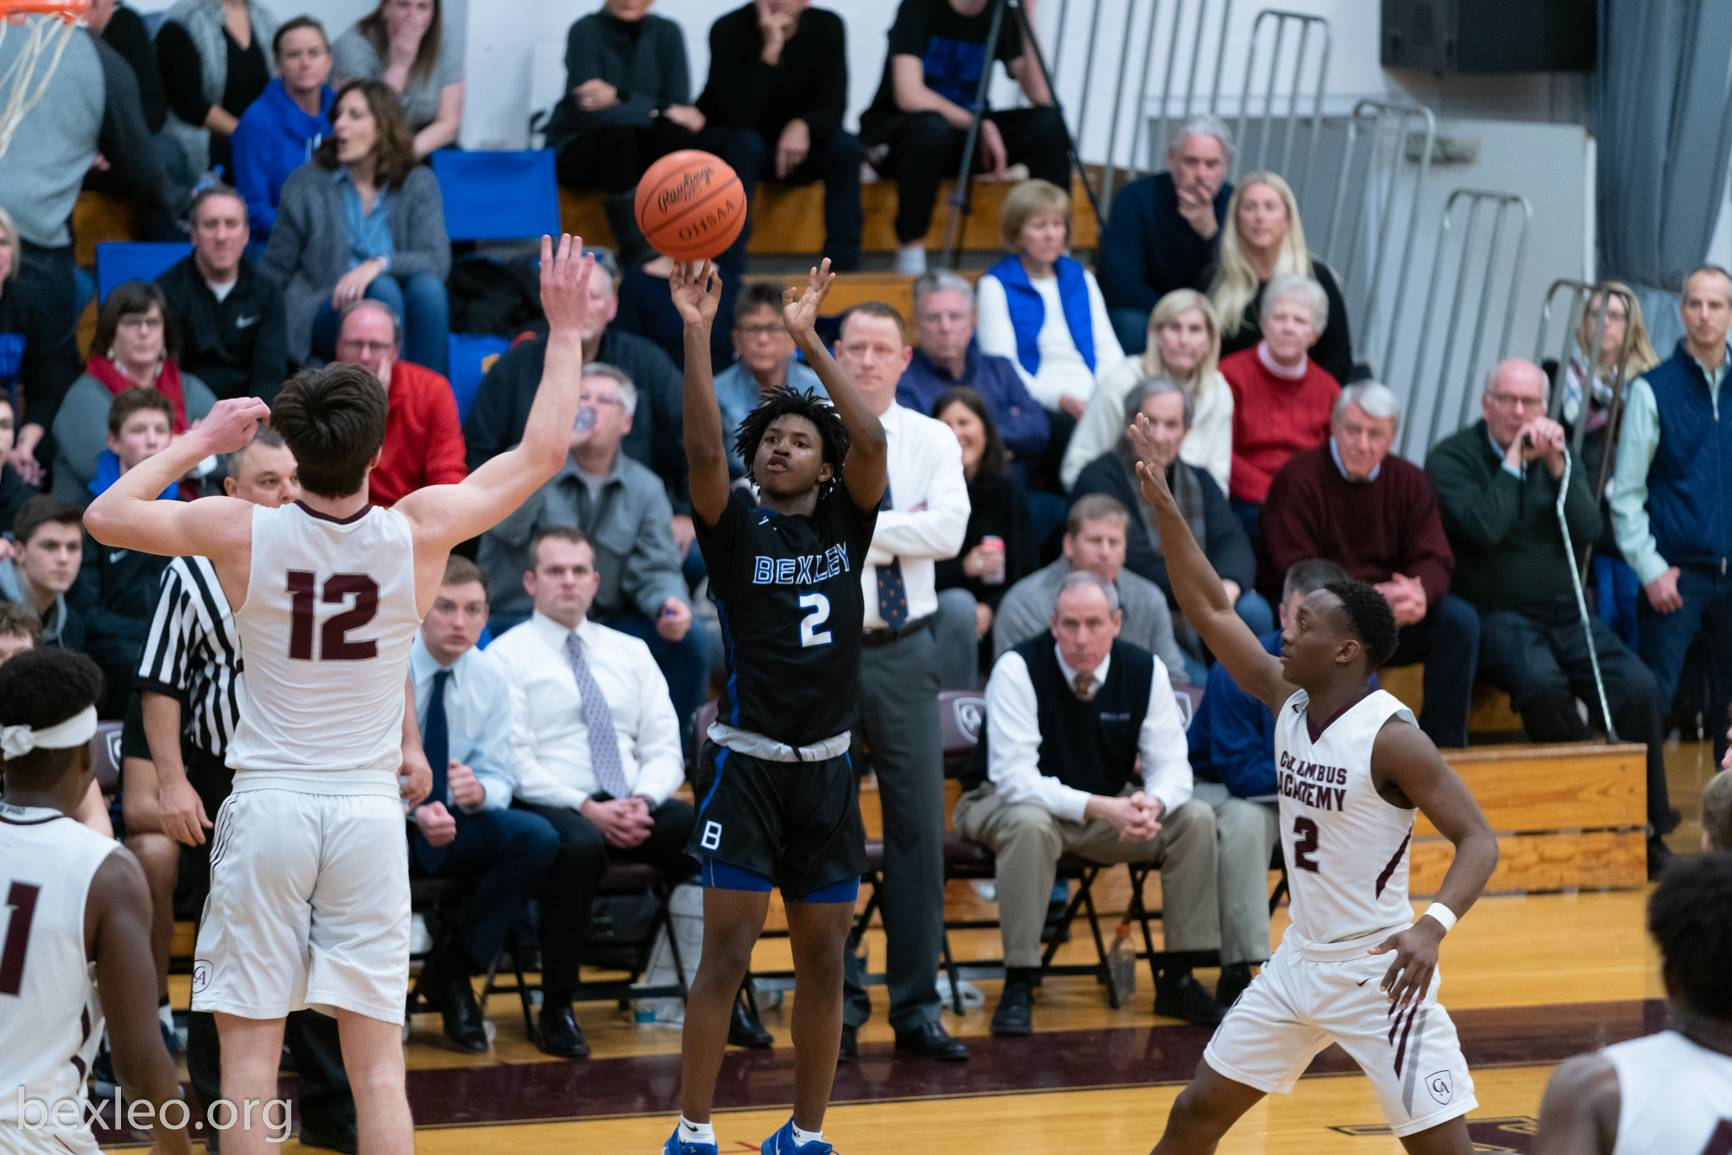 Boys Basketball player shoots a jumper vs Columbus Academy